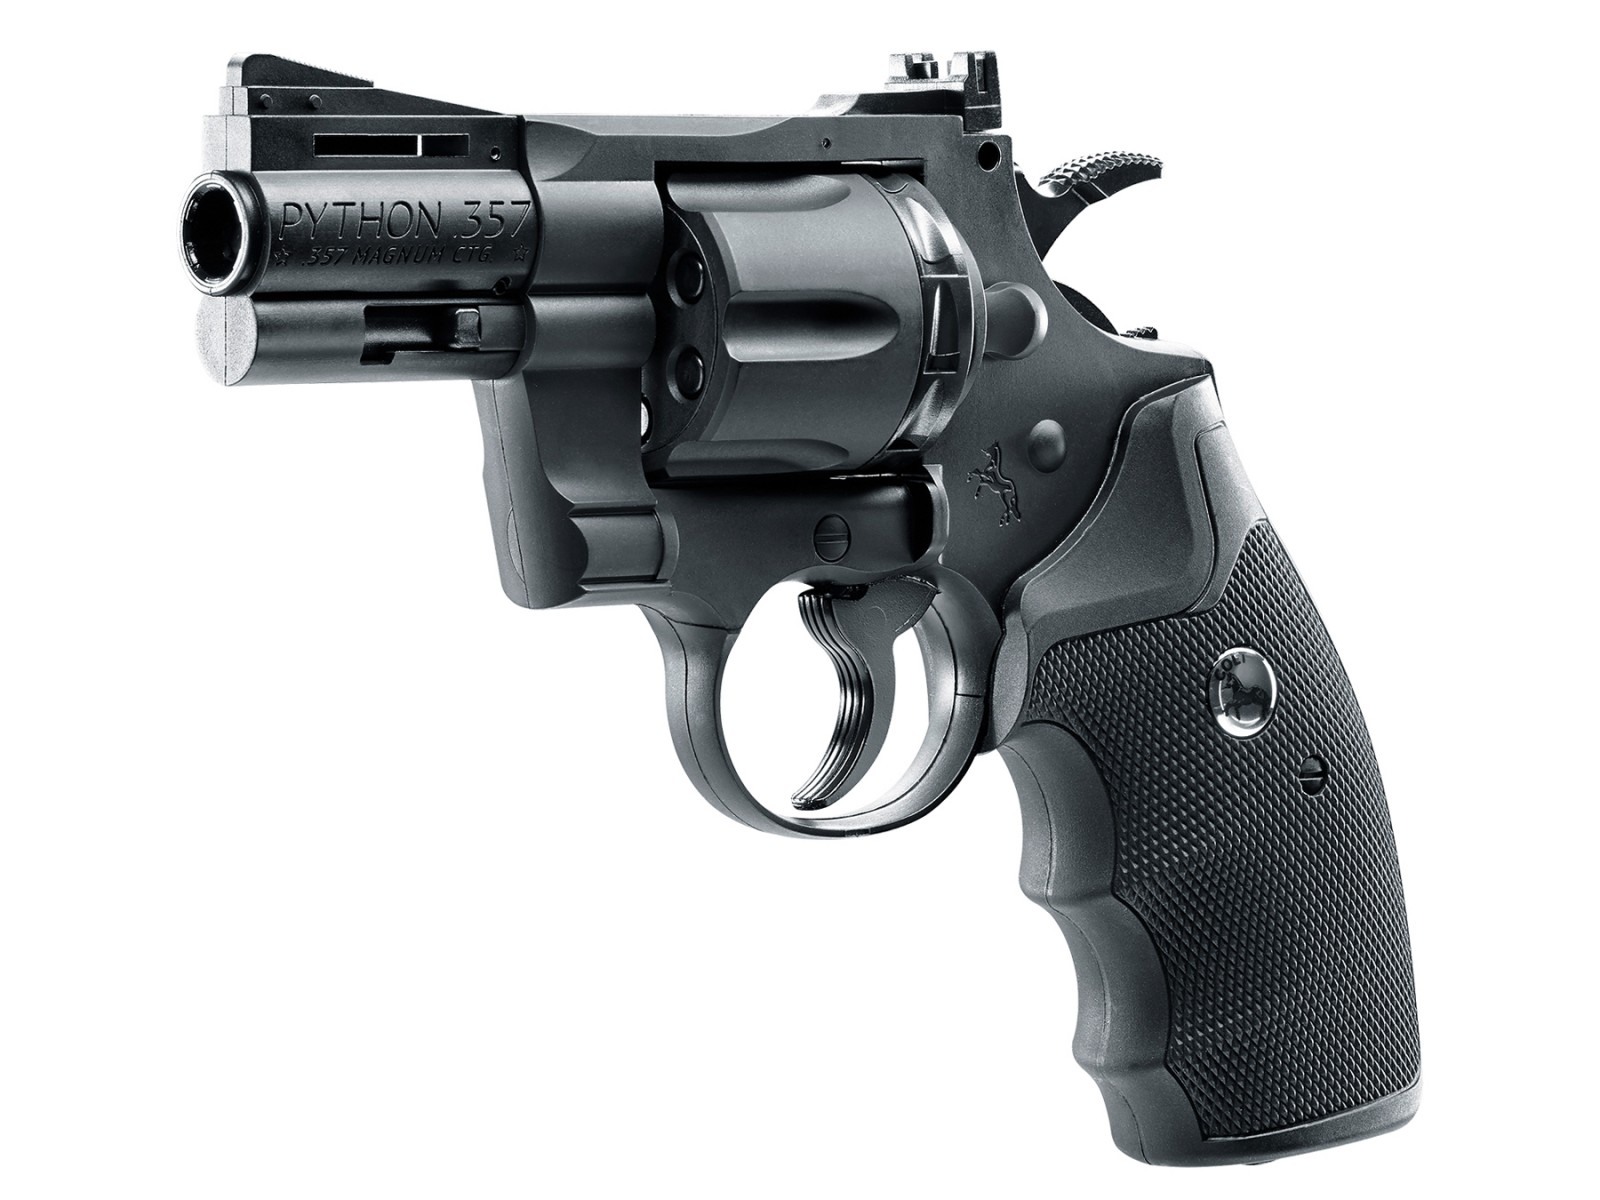 "Colt Python 2.5"" .357 CO2 Pellet/BB Revolver"